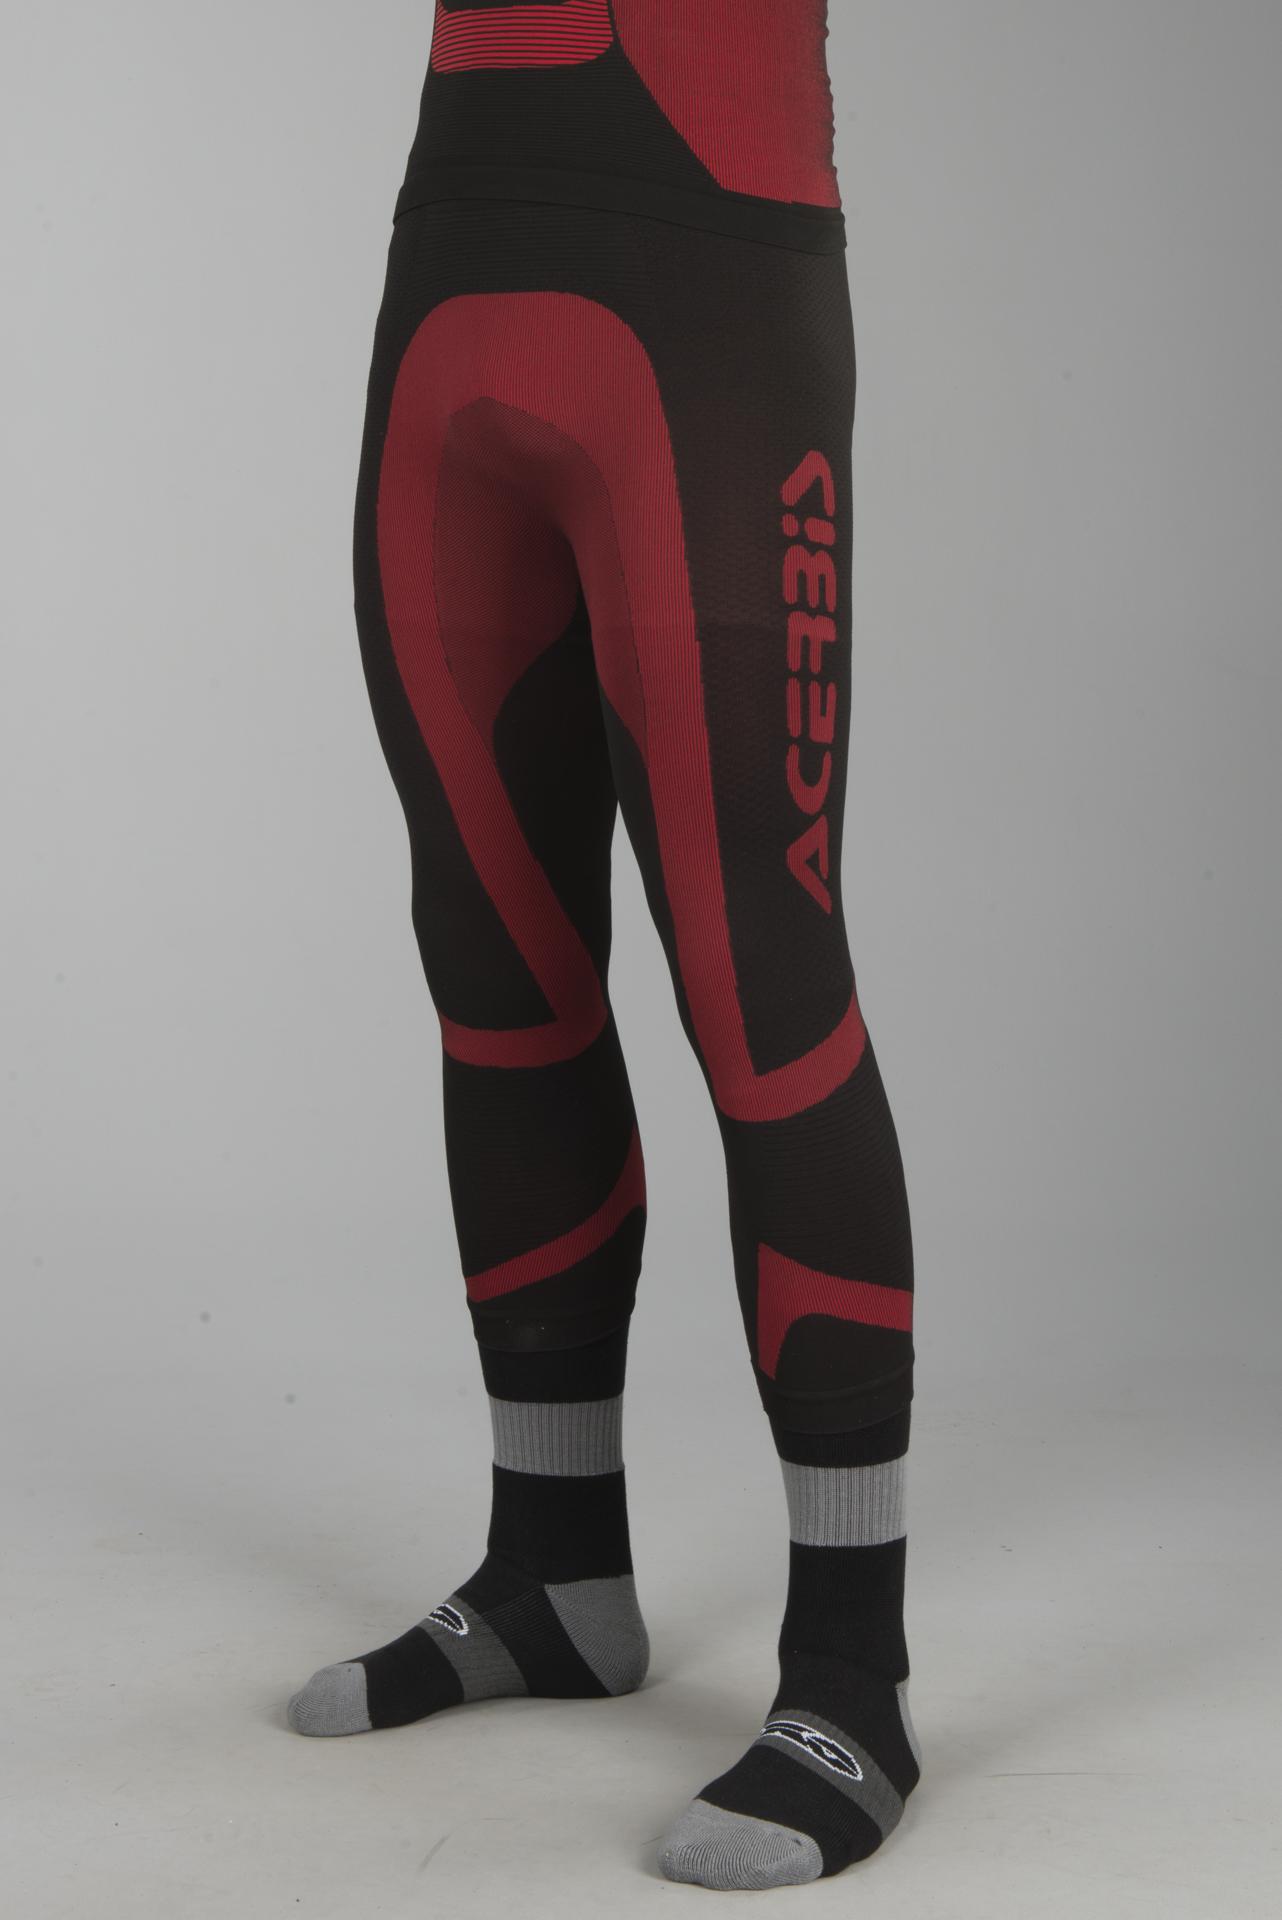 Black//Red Medium//Large Alpinestars Mens Baselayer Bottoms Motorcycle Tech Pant